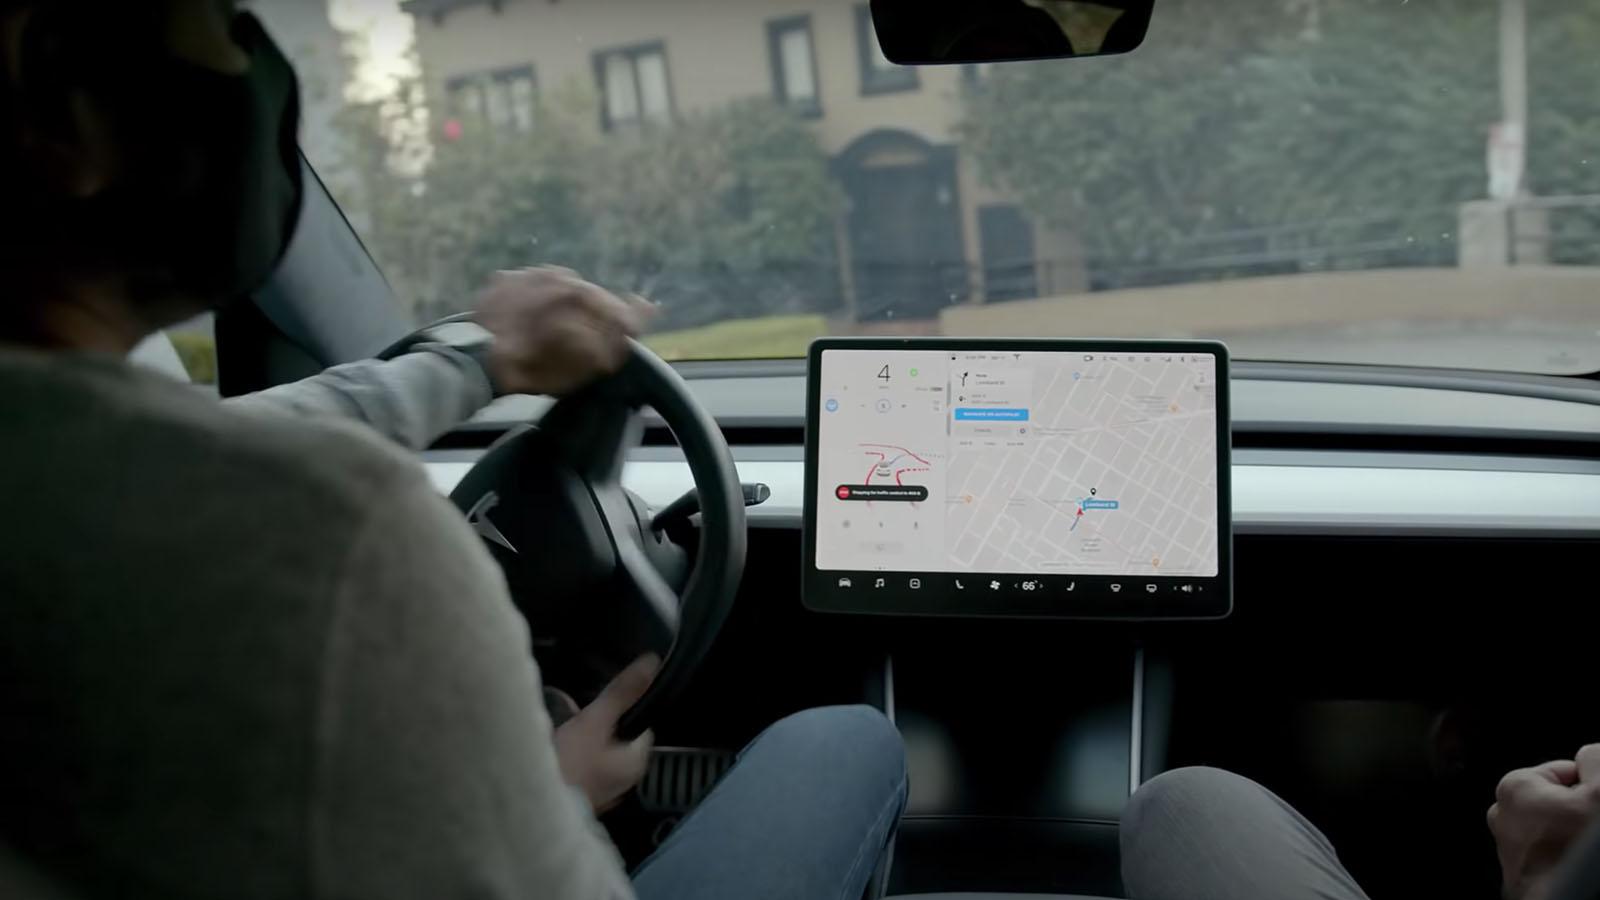 Tesla Autopilot intervention